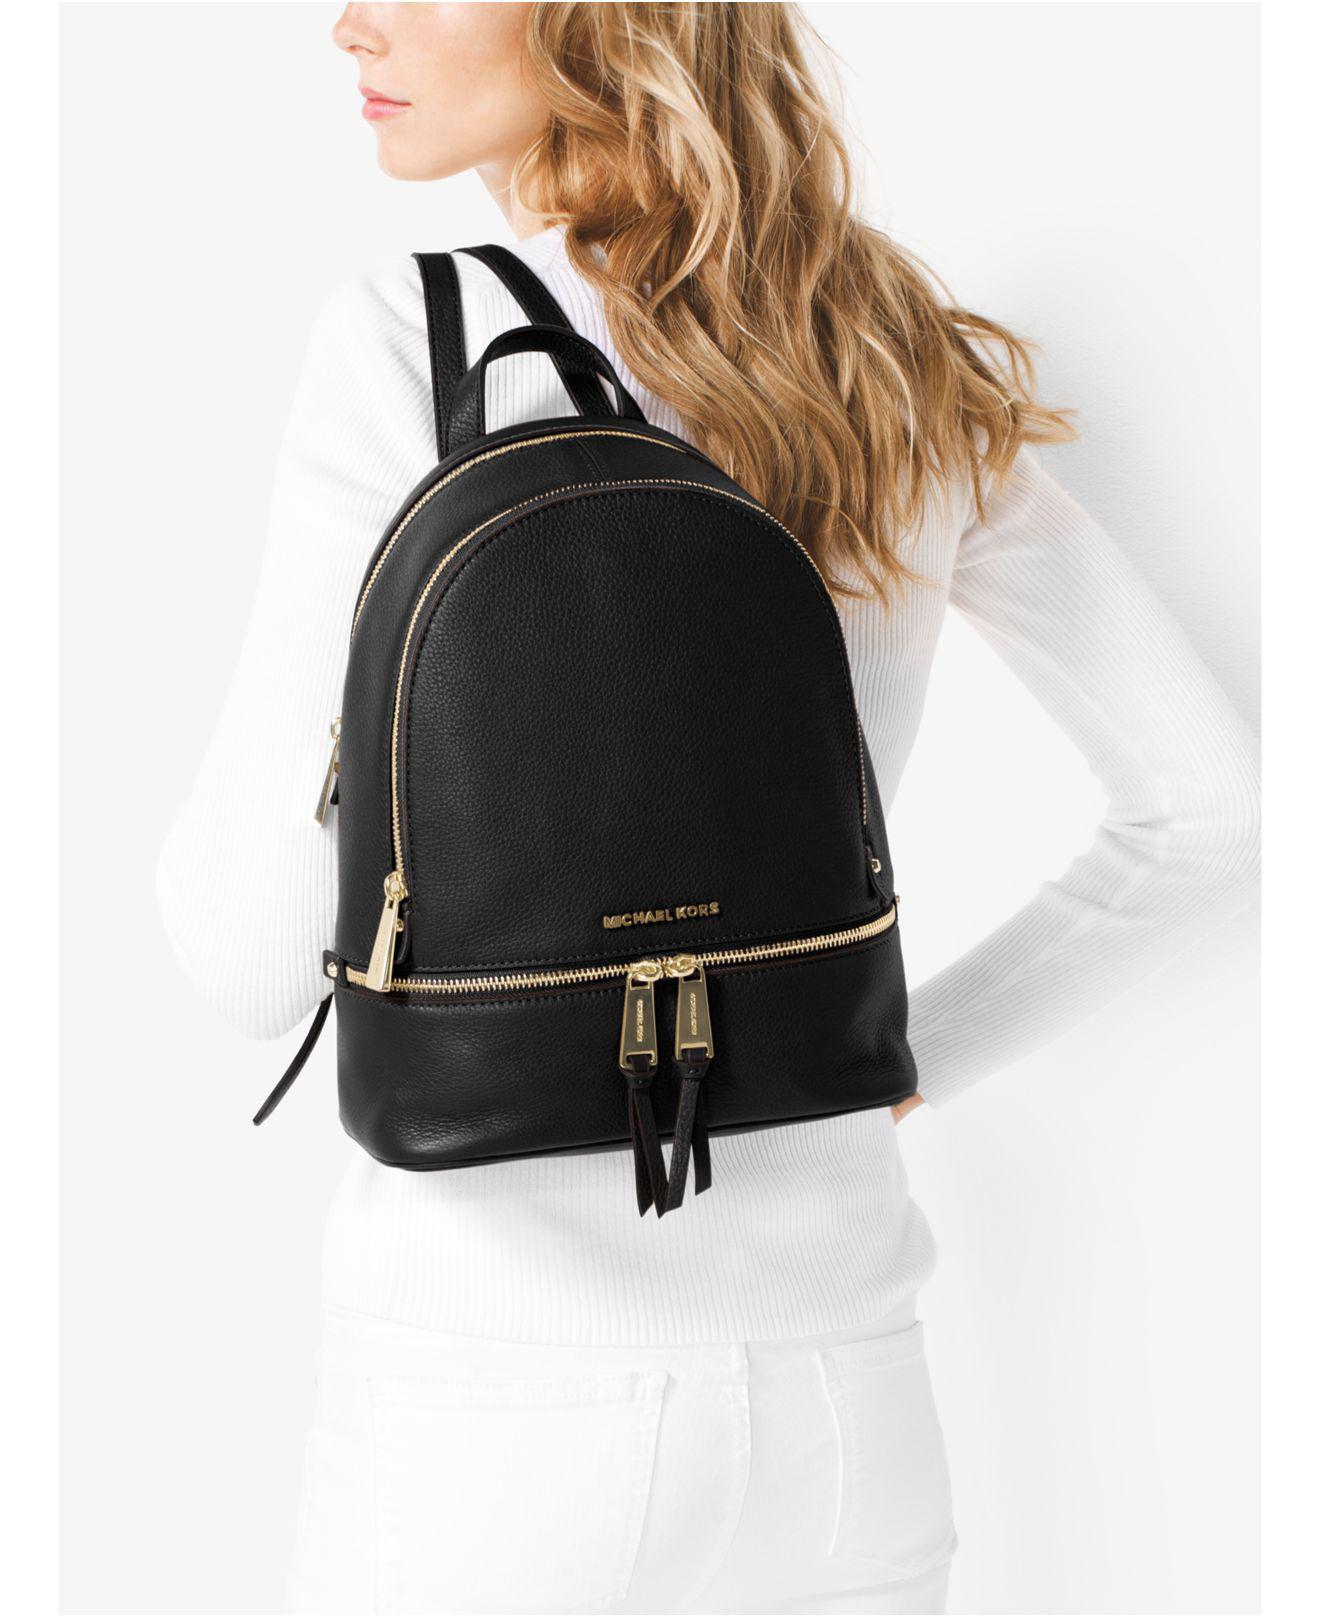 Michael Kors Michael Rhea Zip Small Pebble Leather Backpack in Black - Save  24% - Lyst 17849b3c59